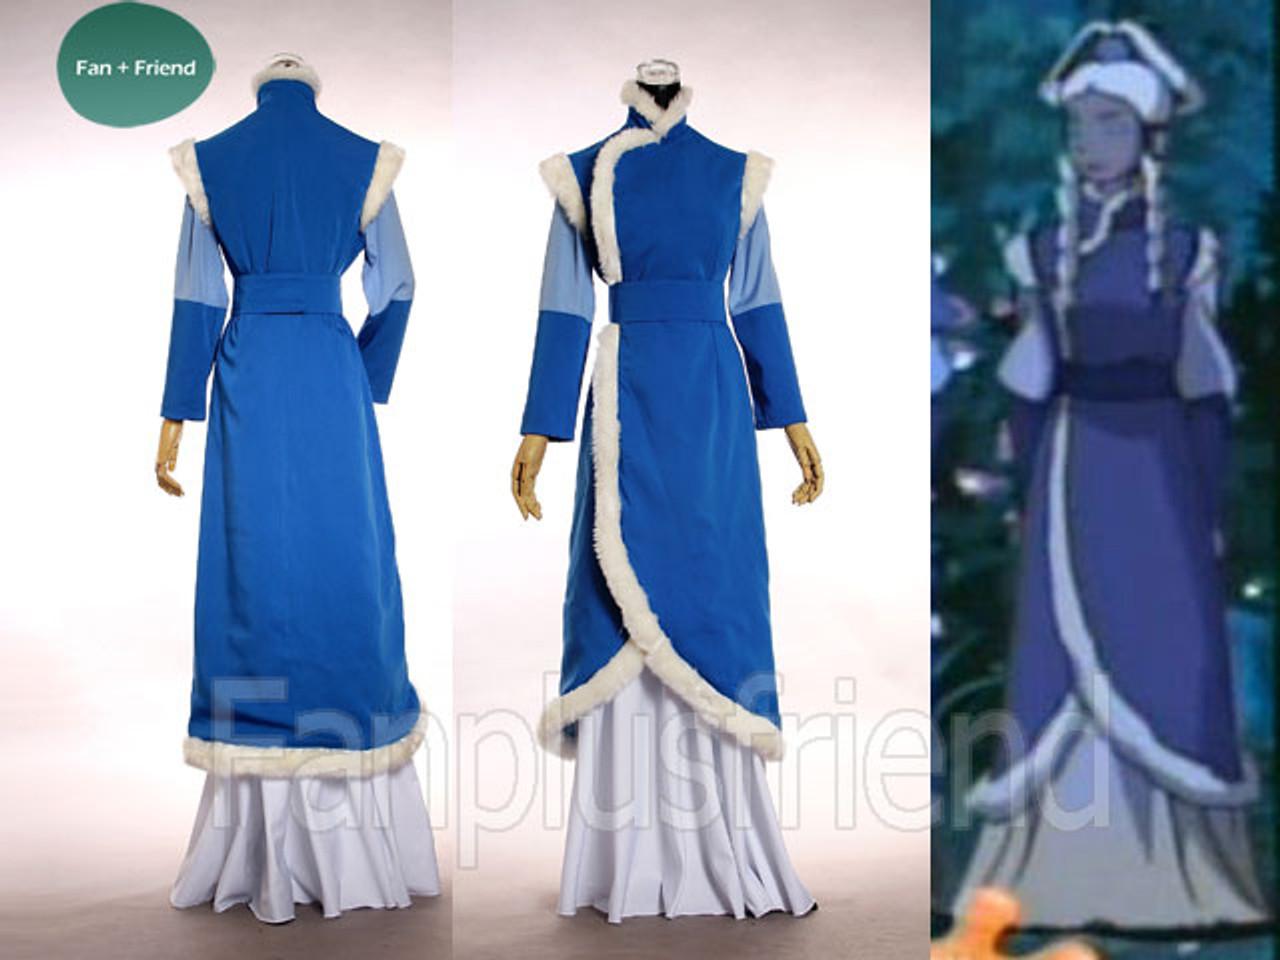 cosplay Avatar last airbender